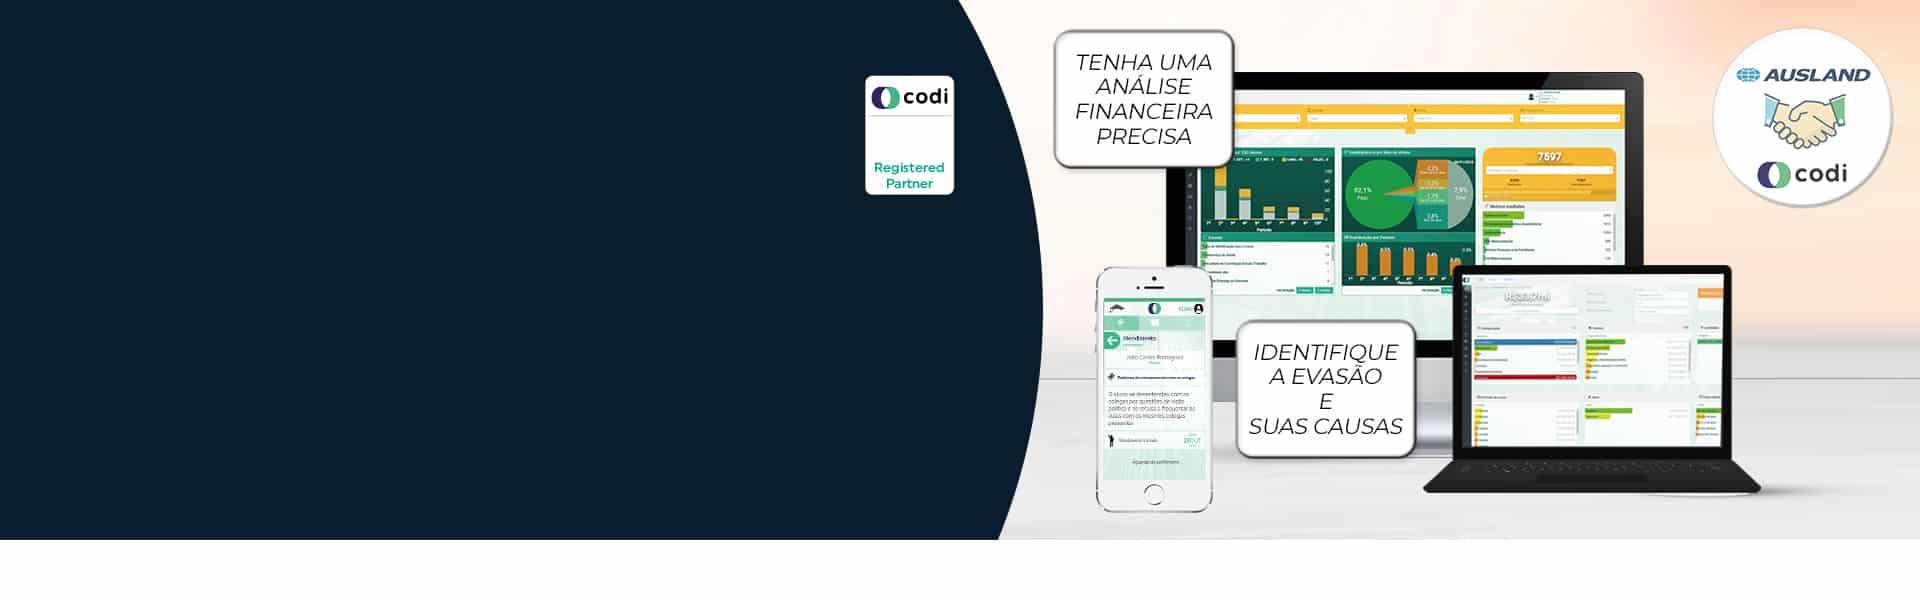 Plataforma CODI